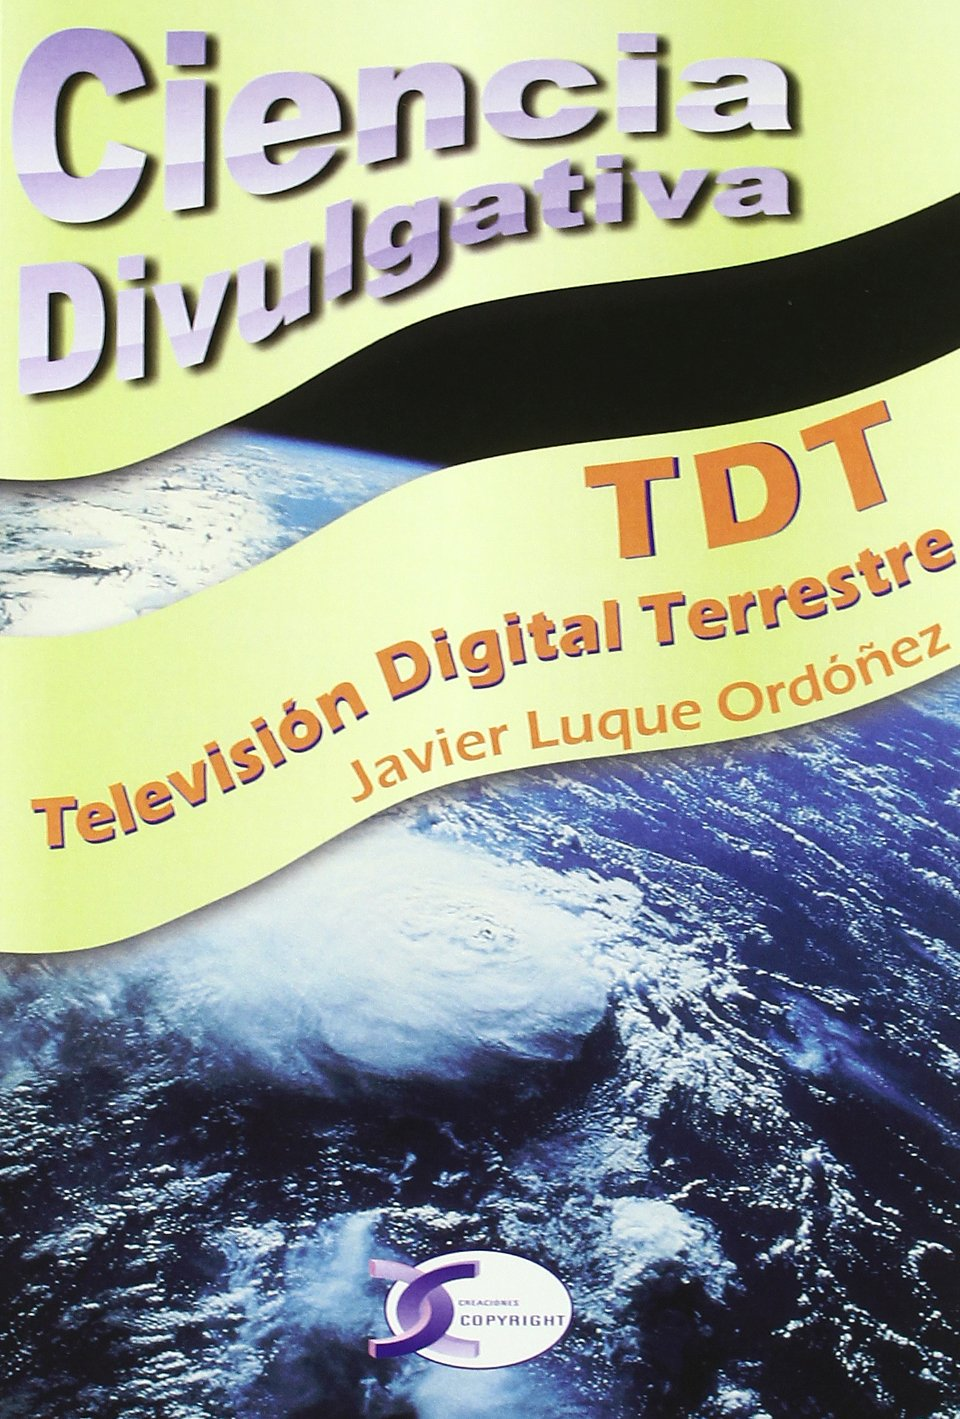 TDT TELEVISION DIGITAL TERRESTRE: Amazon.es: LUQUE ORDOÑEZ,JAVIER ...